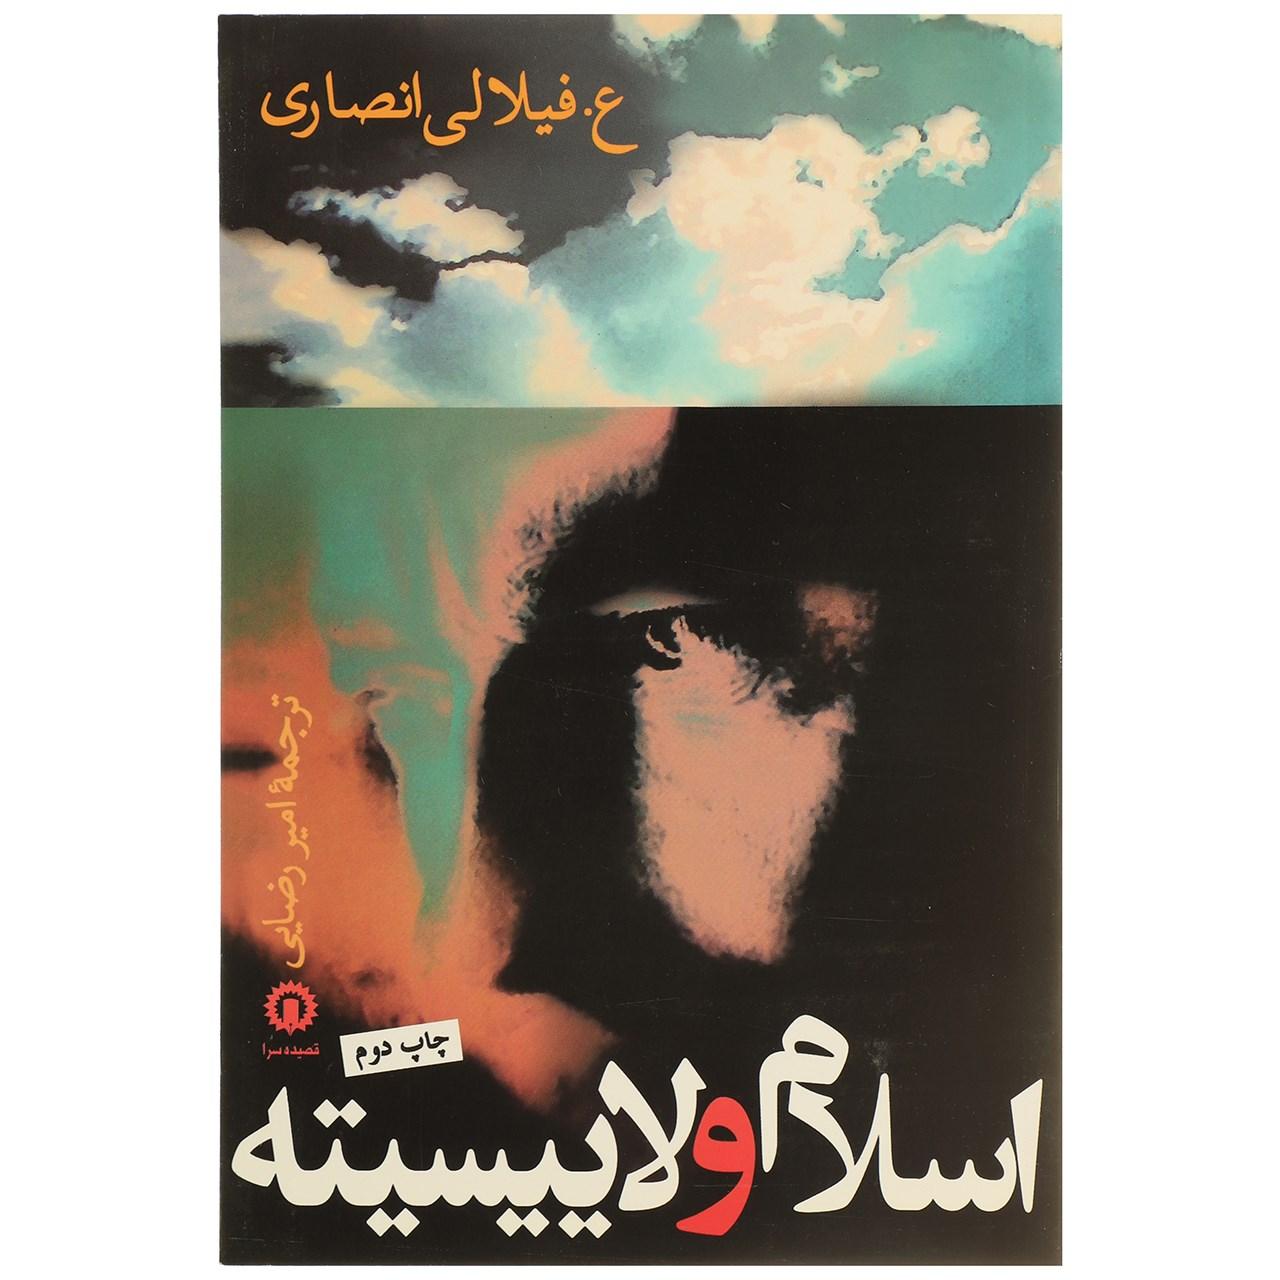 کتاب اسلام و لاییسیته اثر ع.فیلالی انصاری